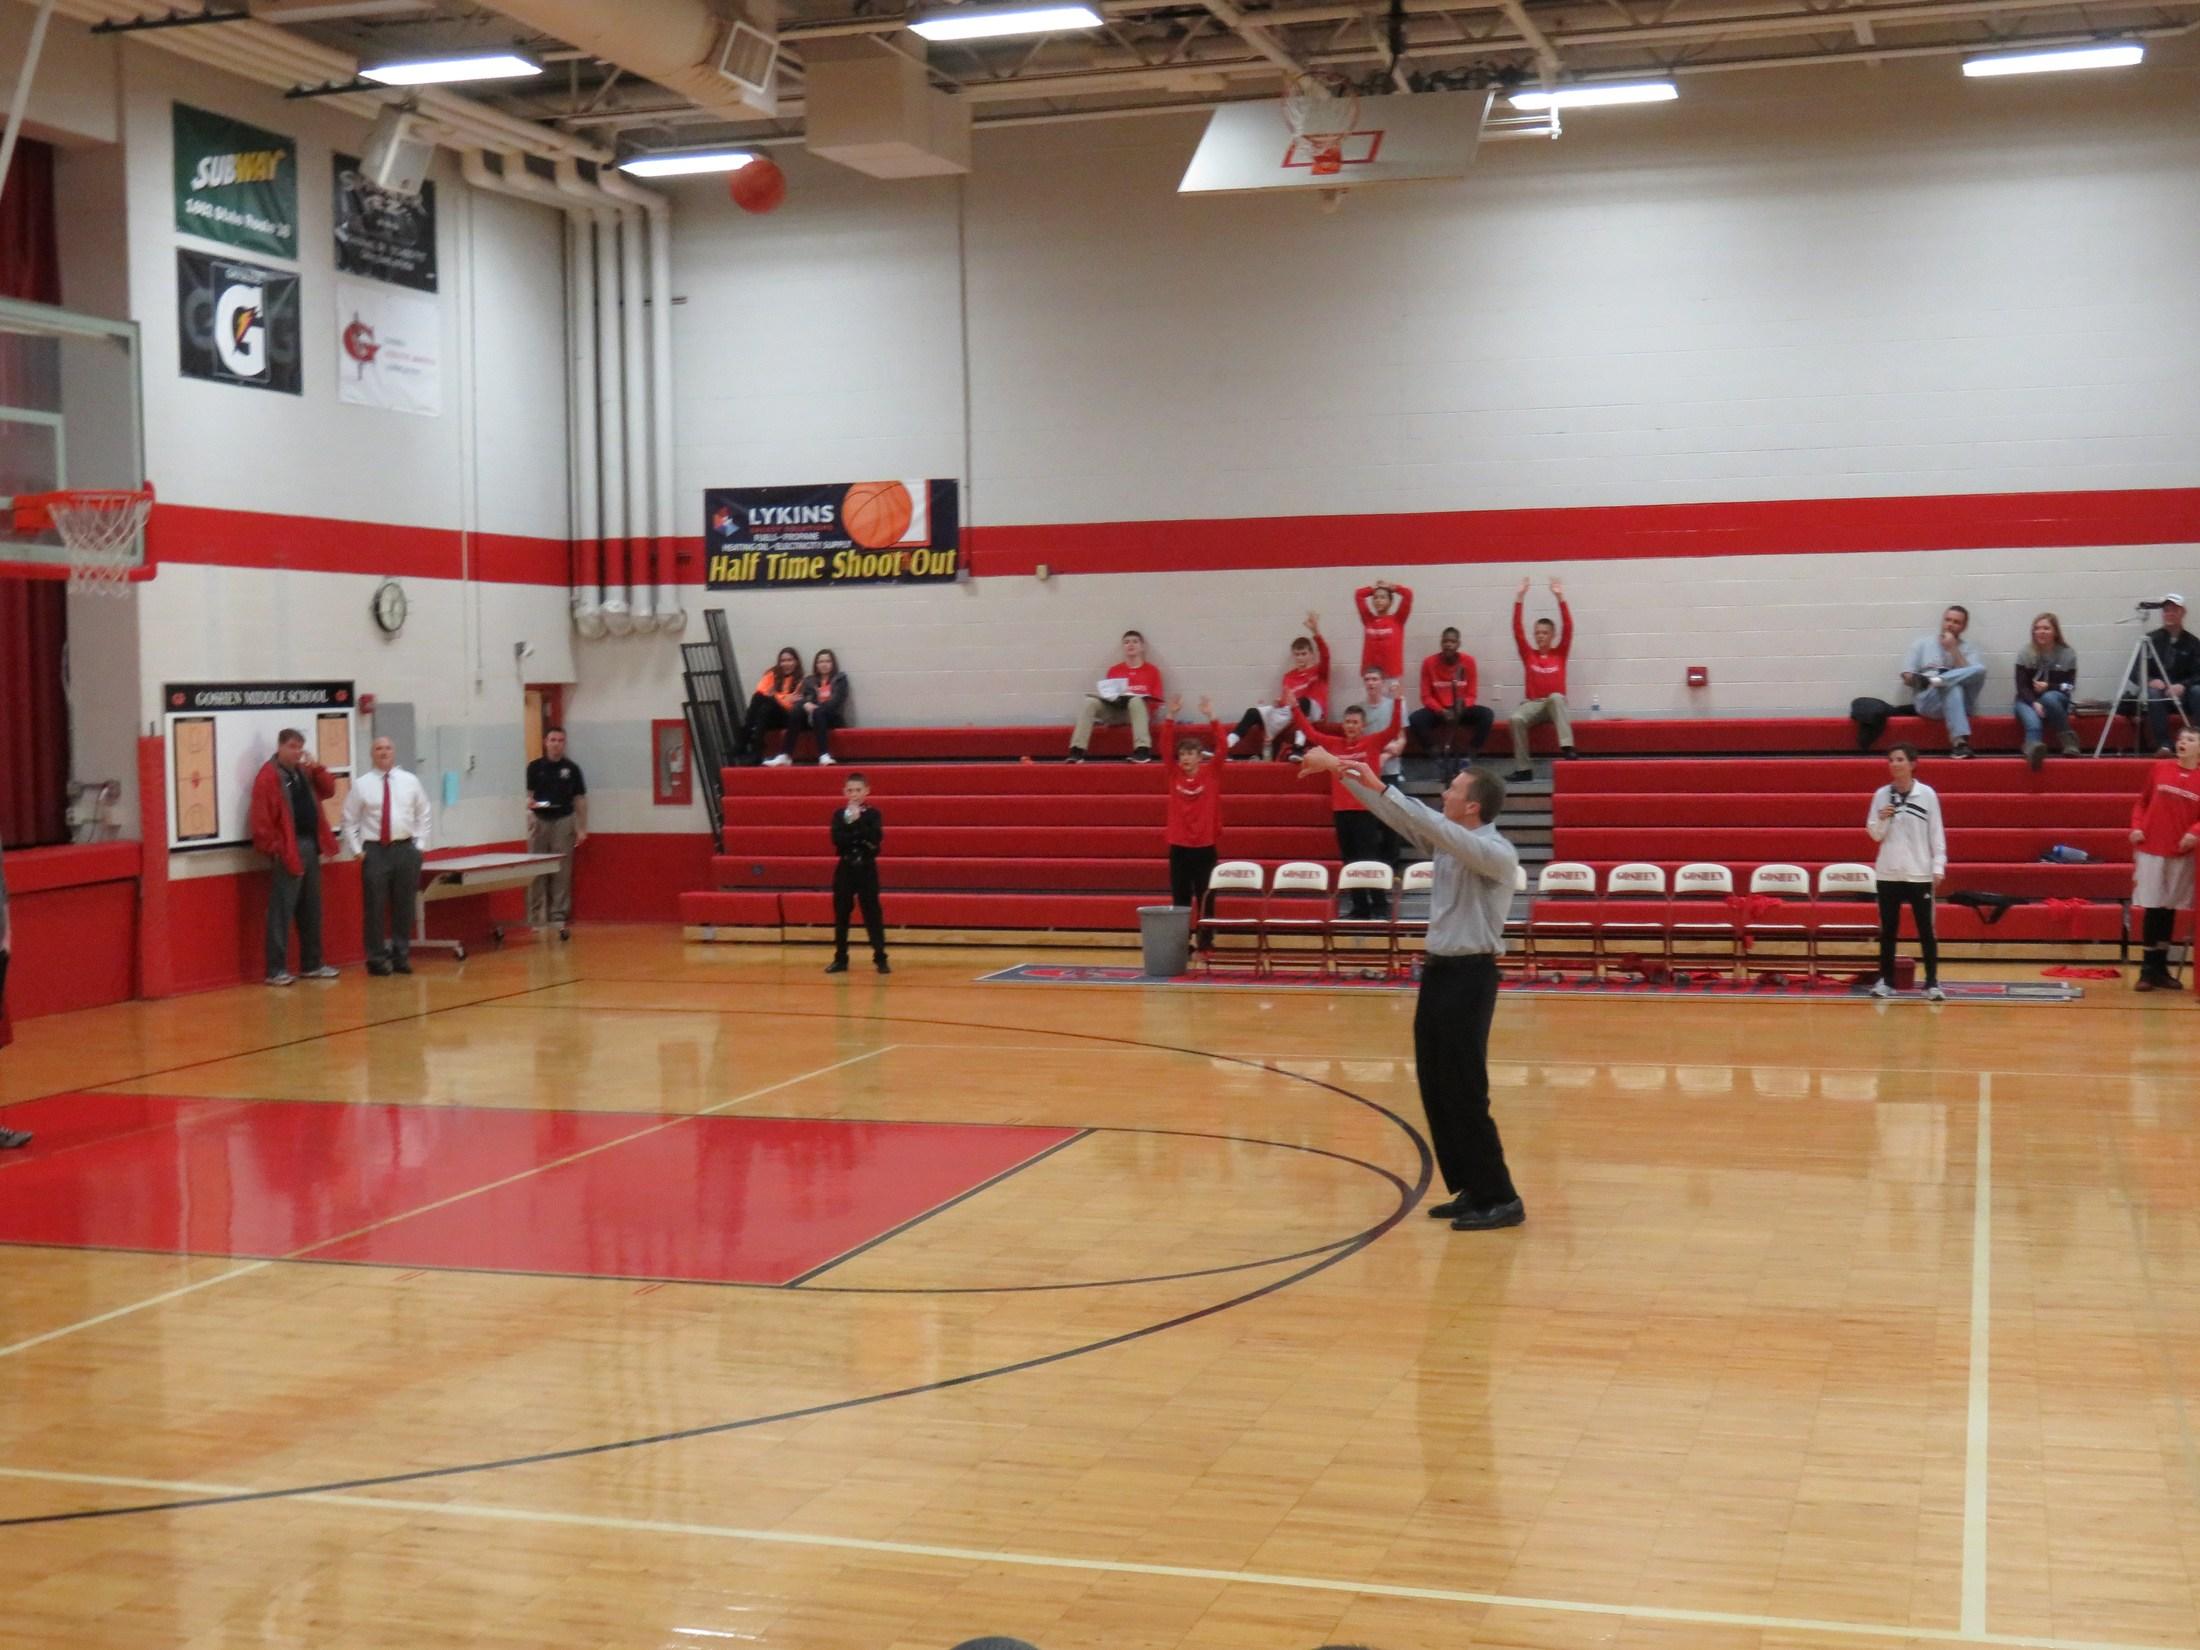 Parent shooting Lykins Energy halftime shot